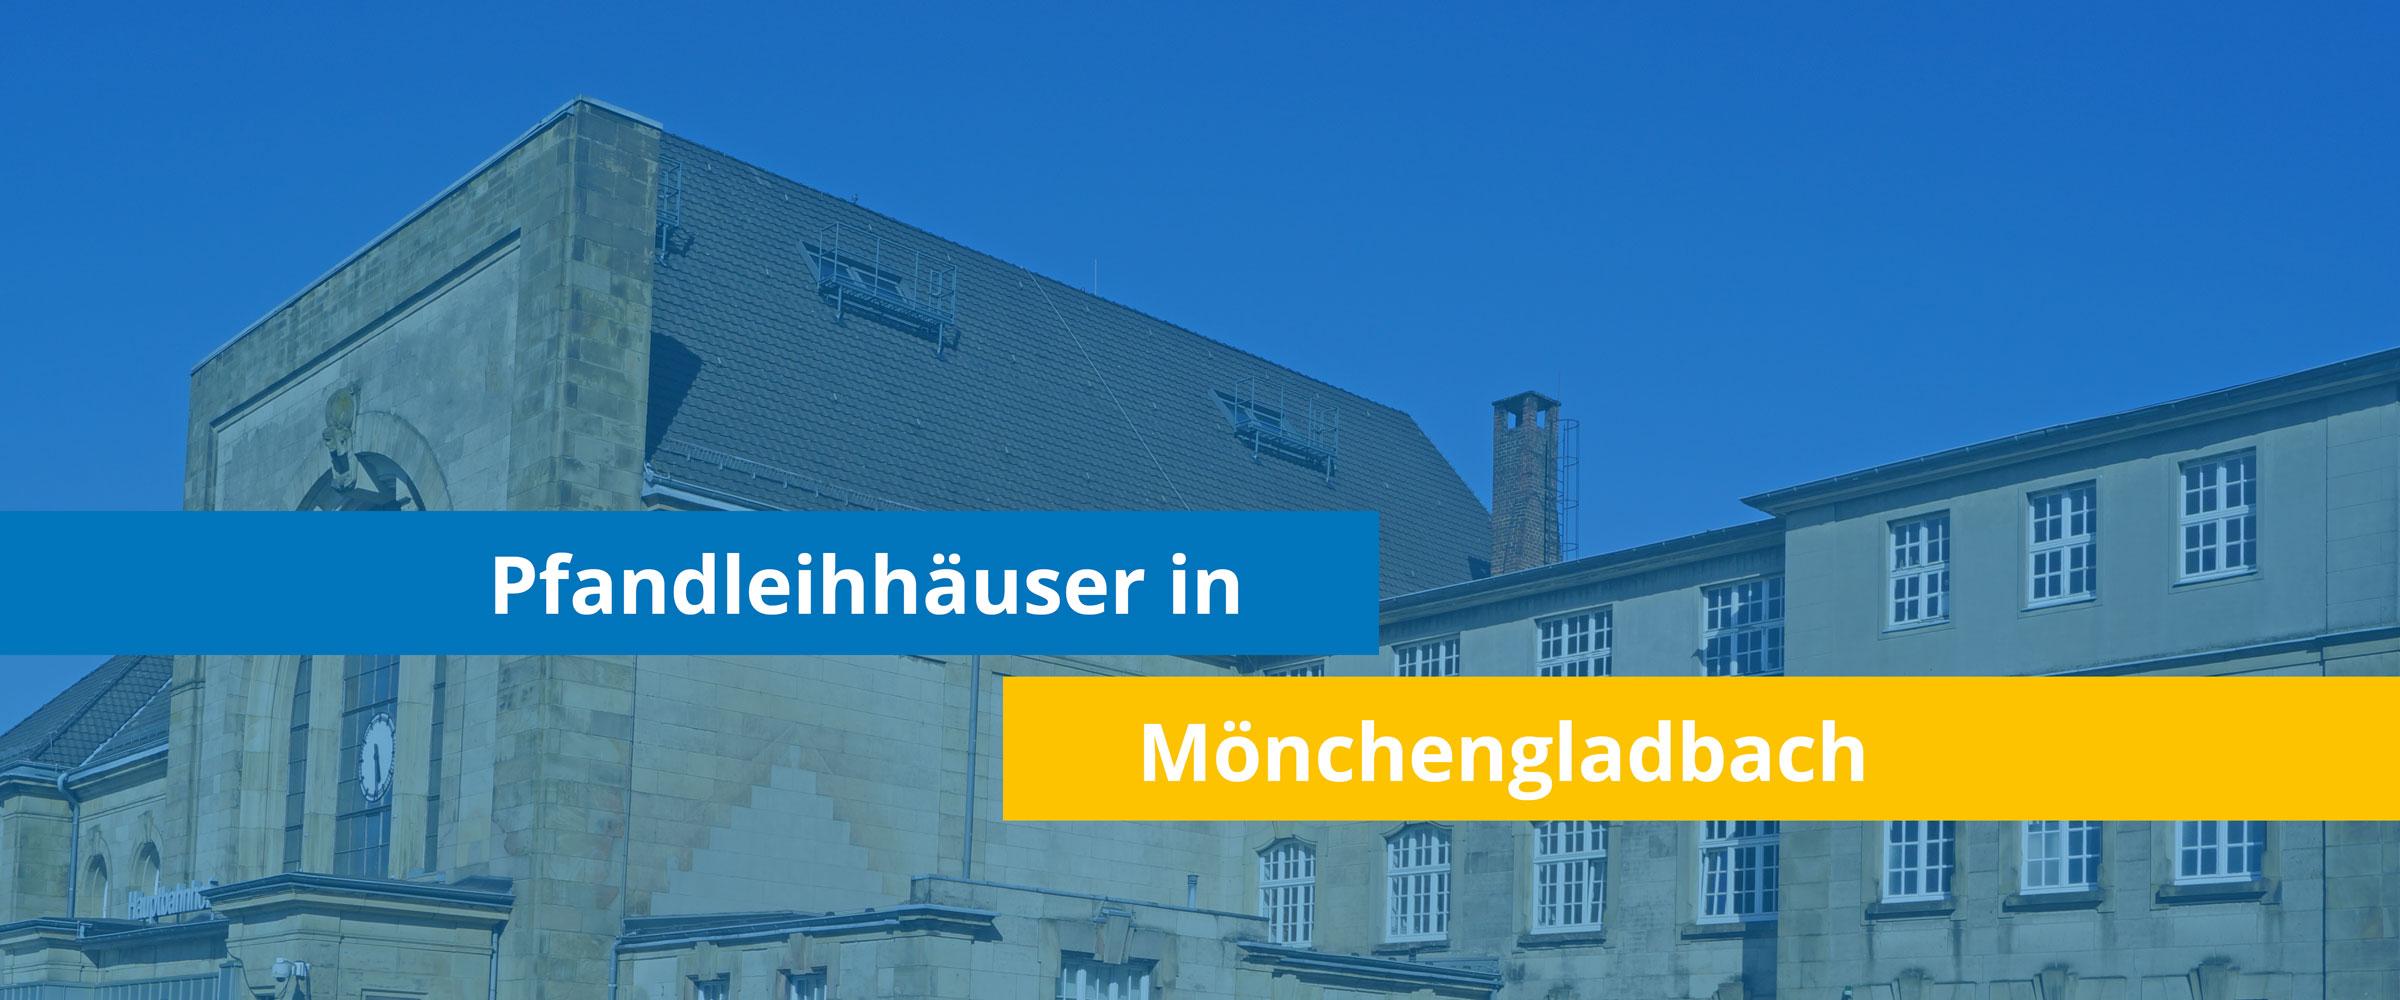 Leihhäuser in Mönchengladbach